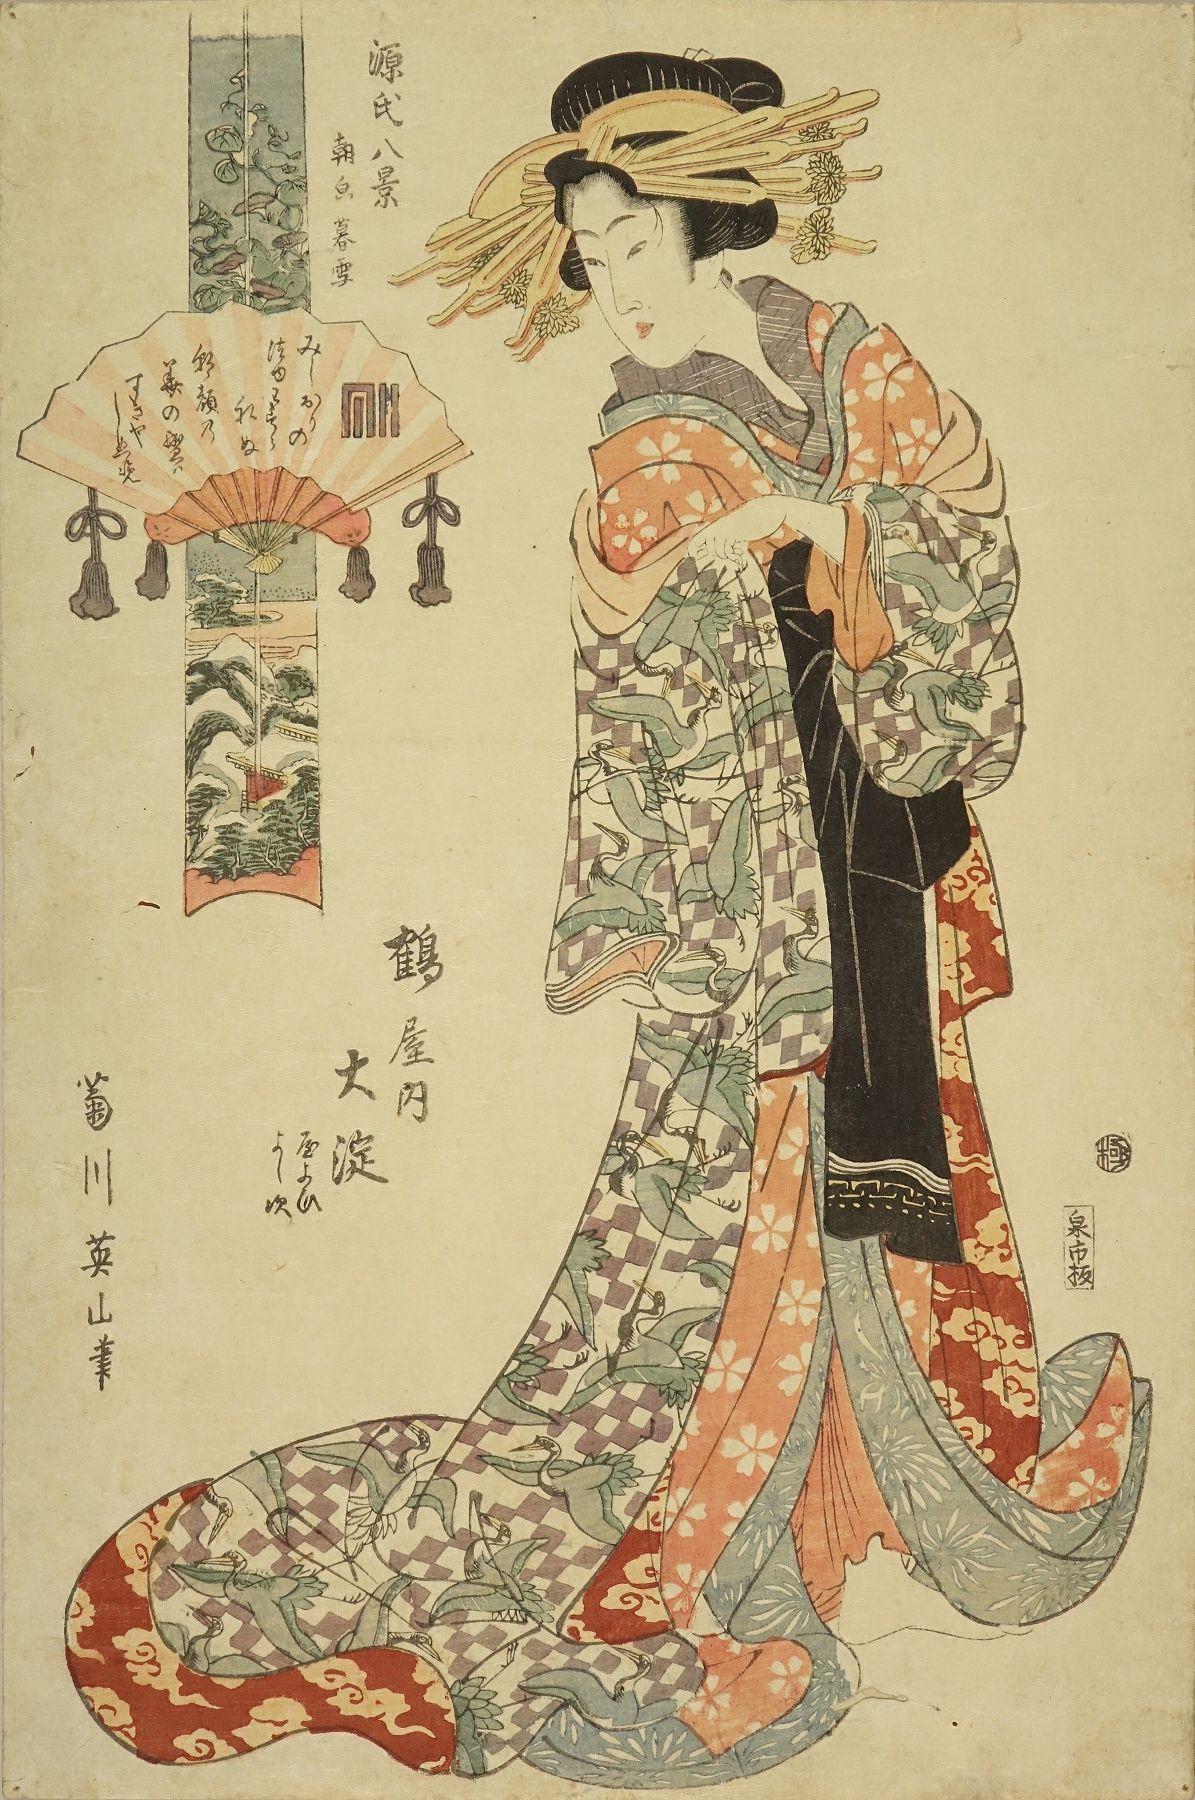 EIZAN Portrait of the courtesan Oyodo of Tsuruya, from <i>Genji hakkei</i> (Eight scenes of the Tale of Genji)